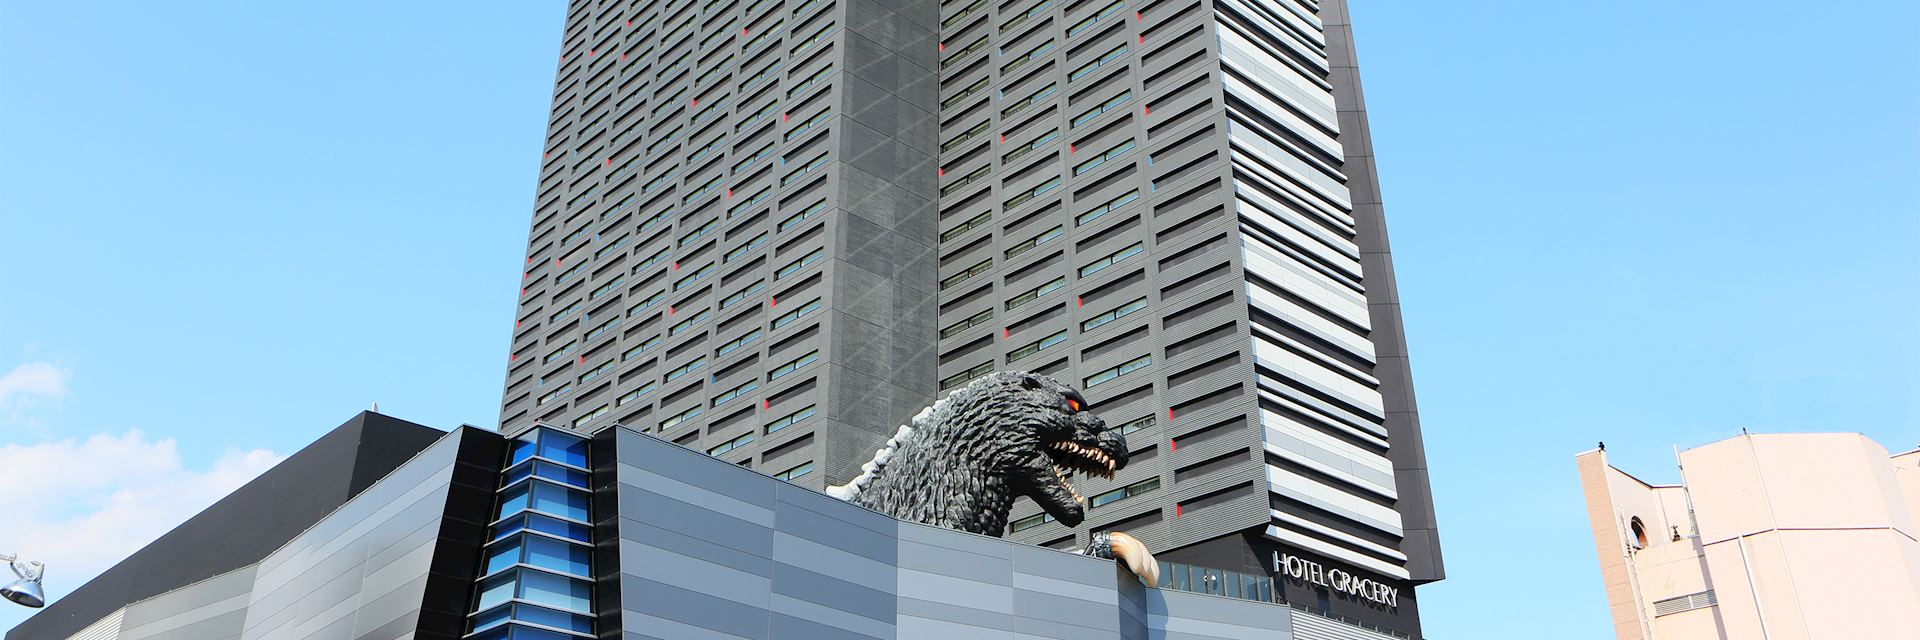 Hotel_Gracery_Shinjuku_15999731_3000x1000